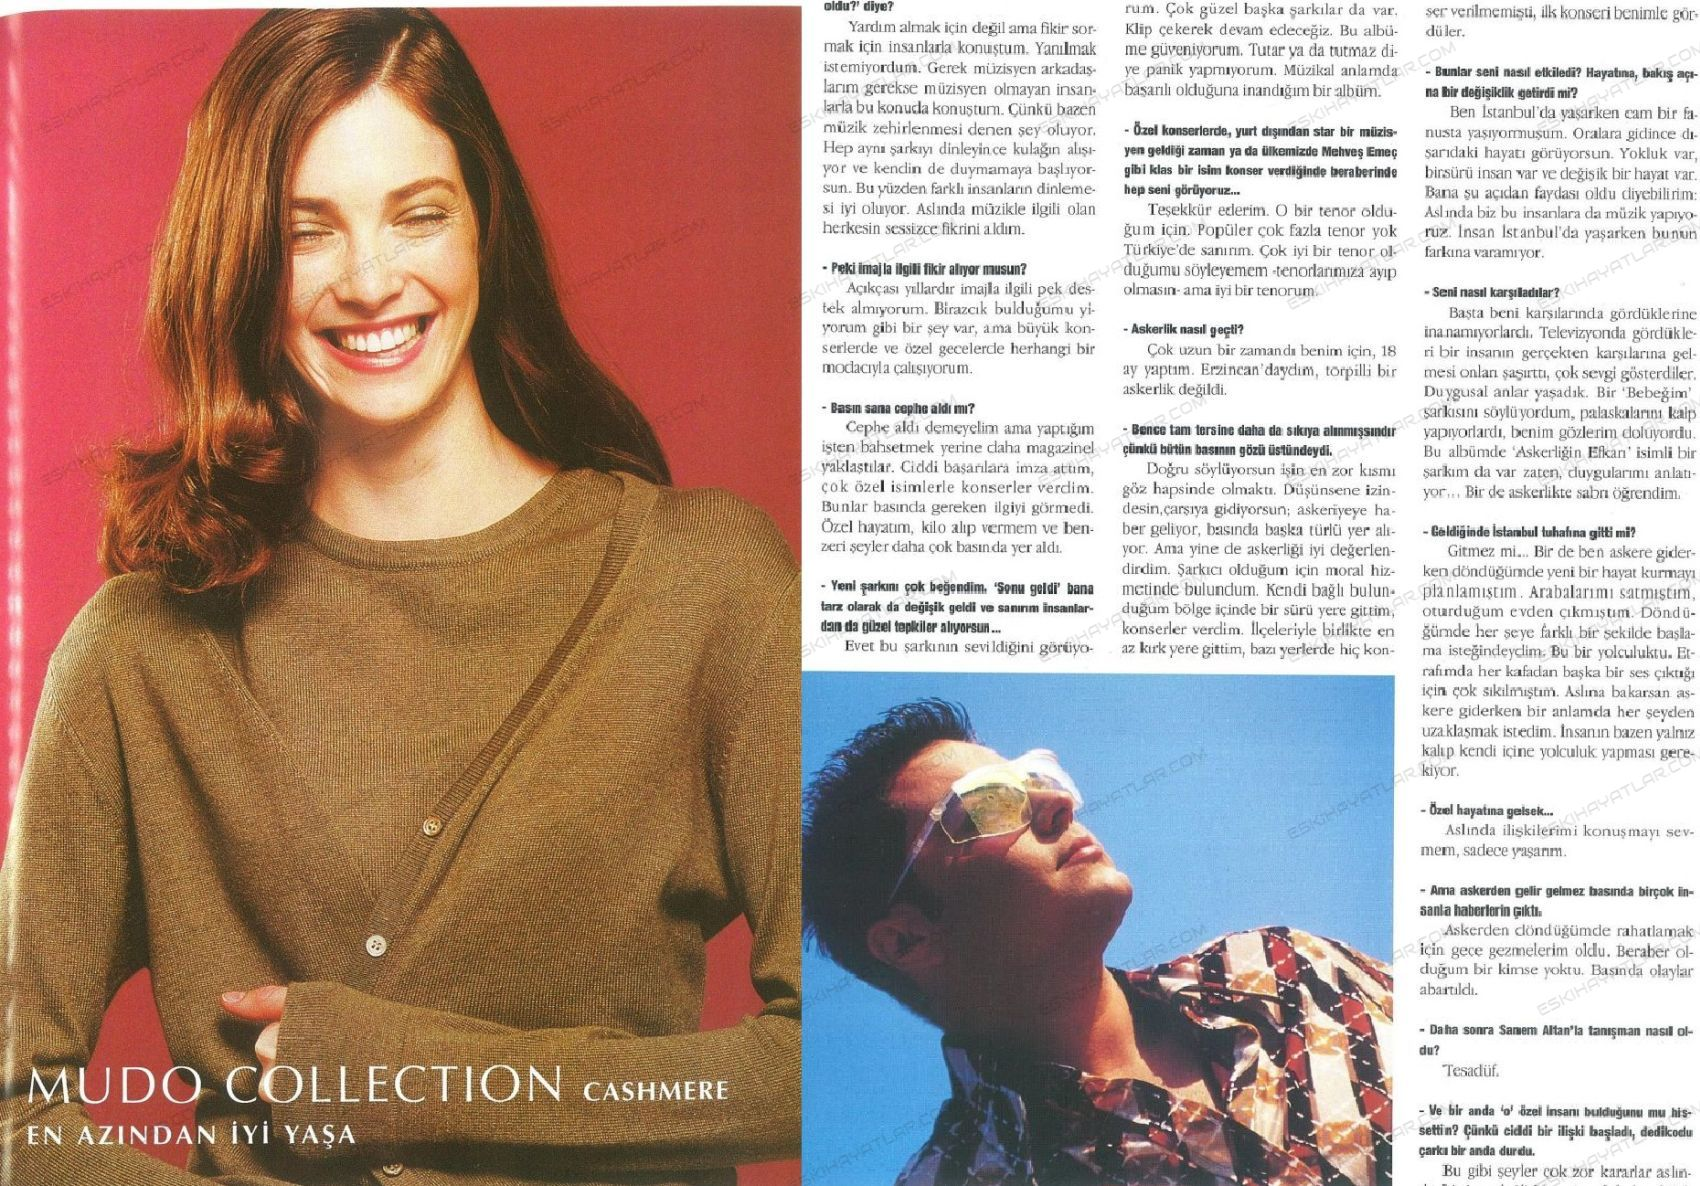 0220-burak-kut-roportaji-2000-yili-cosmopolitan-dergisi-seray-sever-nokia-3310-reklami (4)